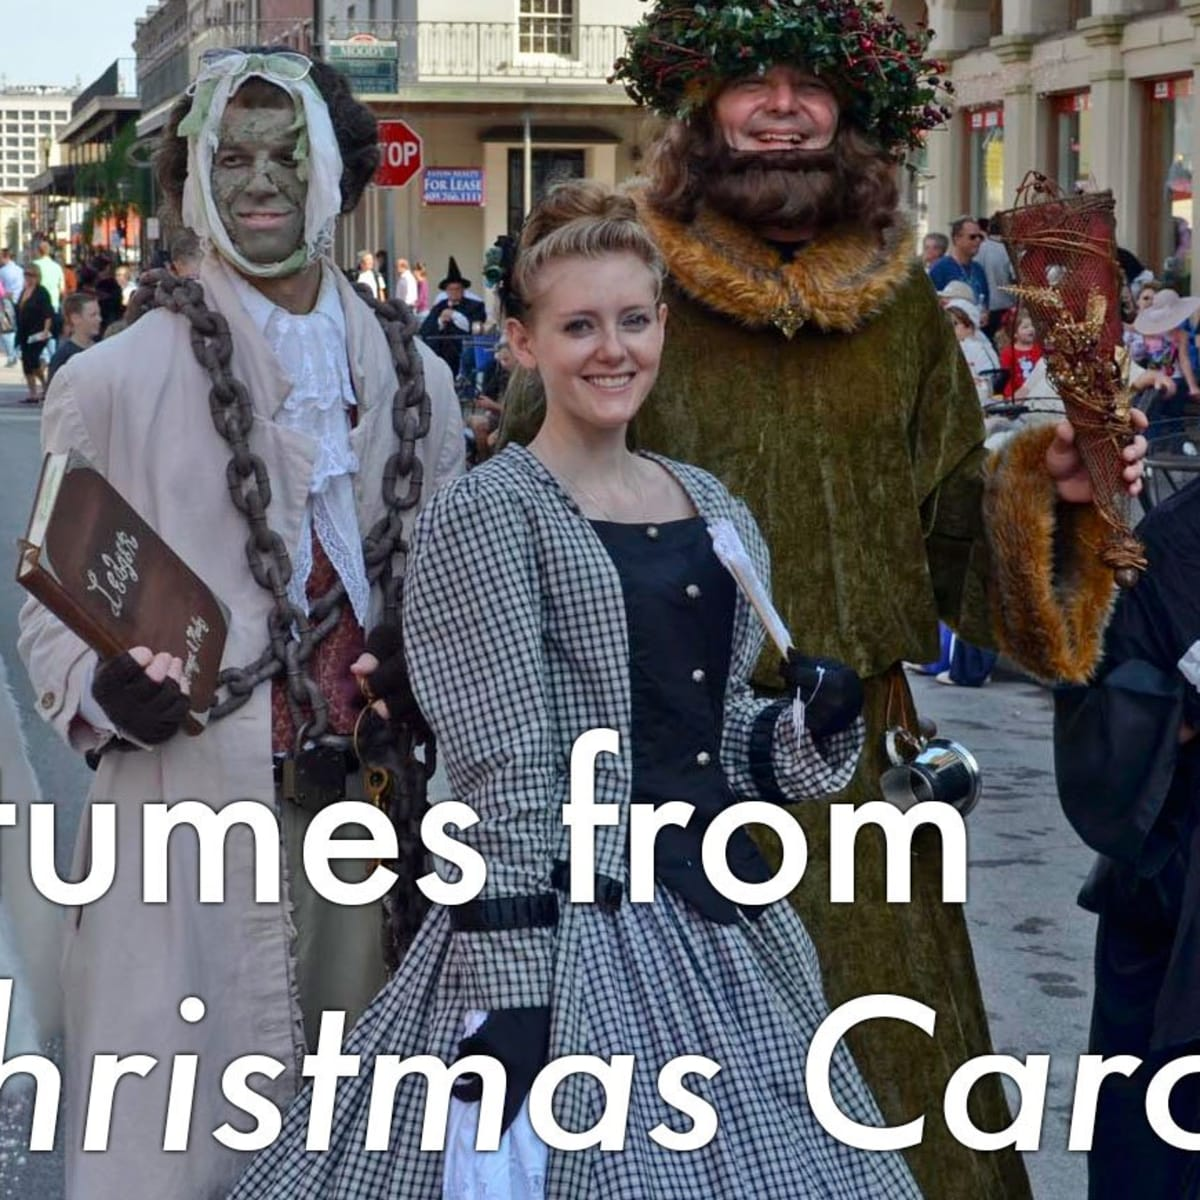 Dickens Christmas play costume Ebenezer Scrooge